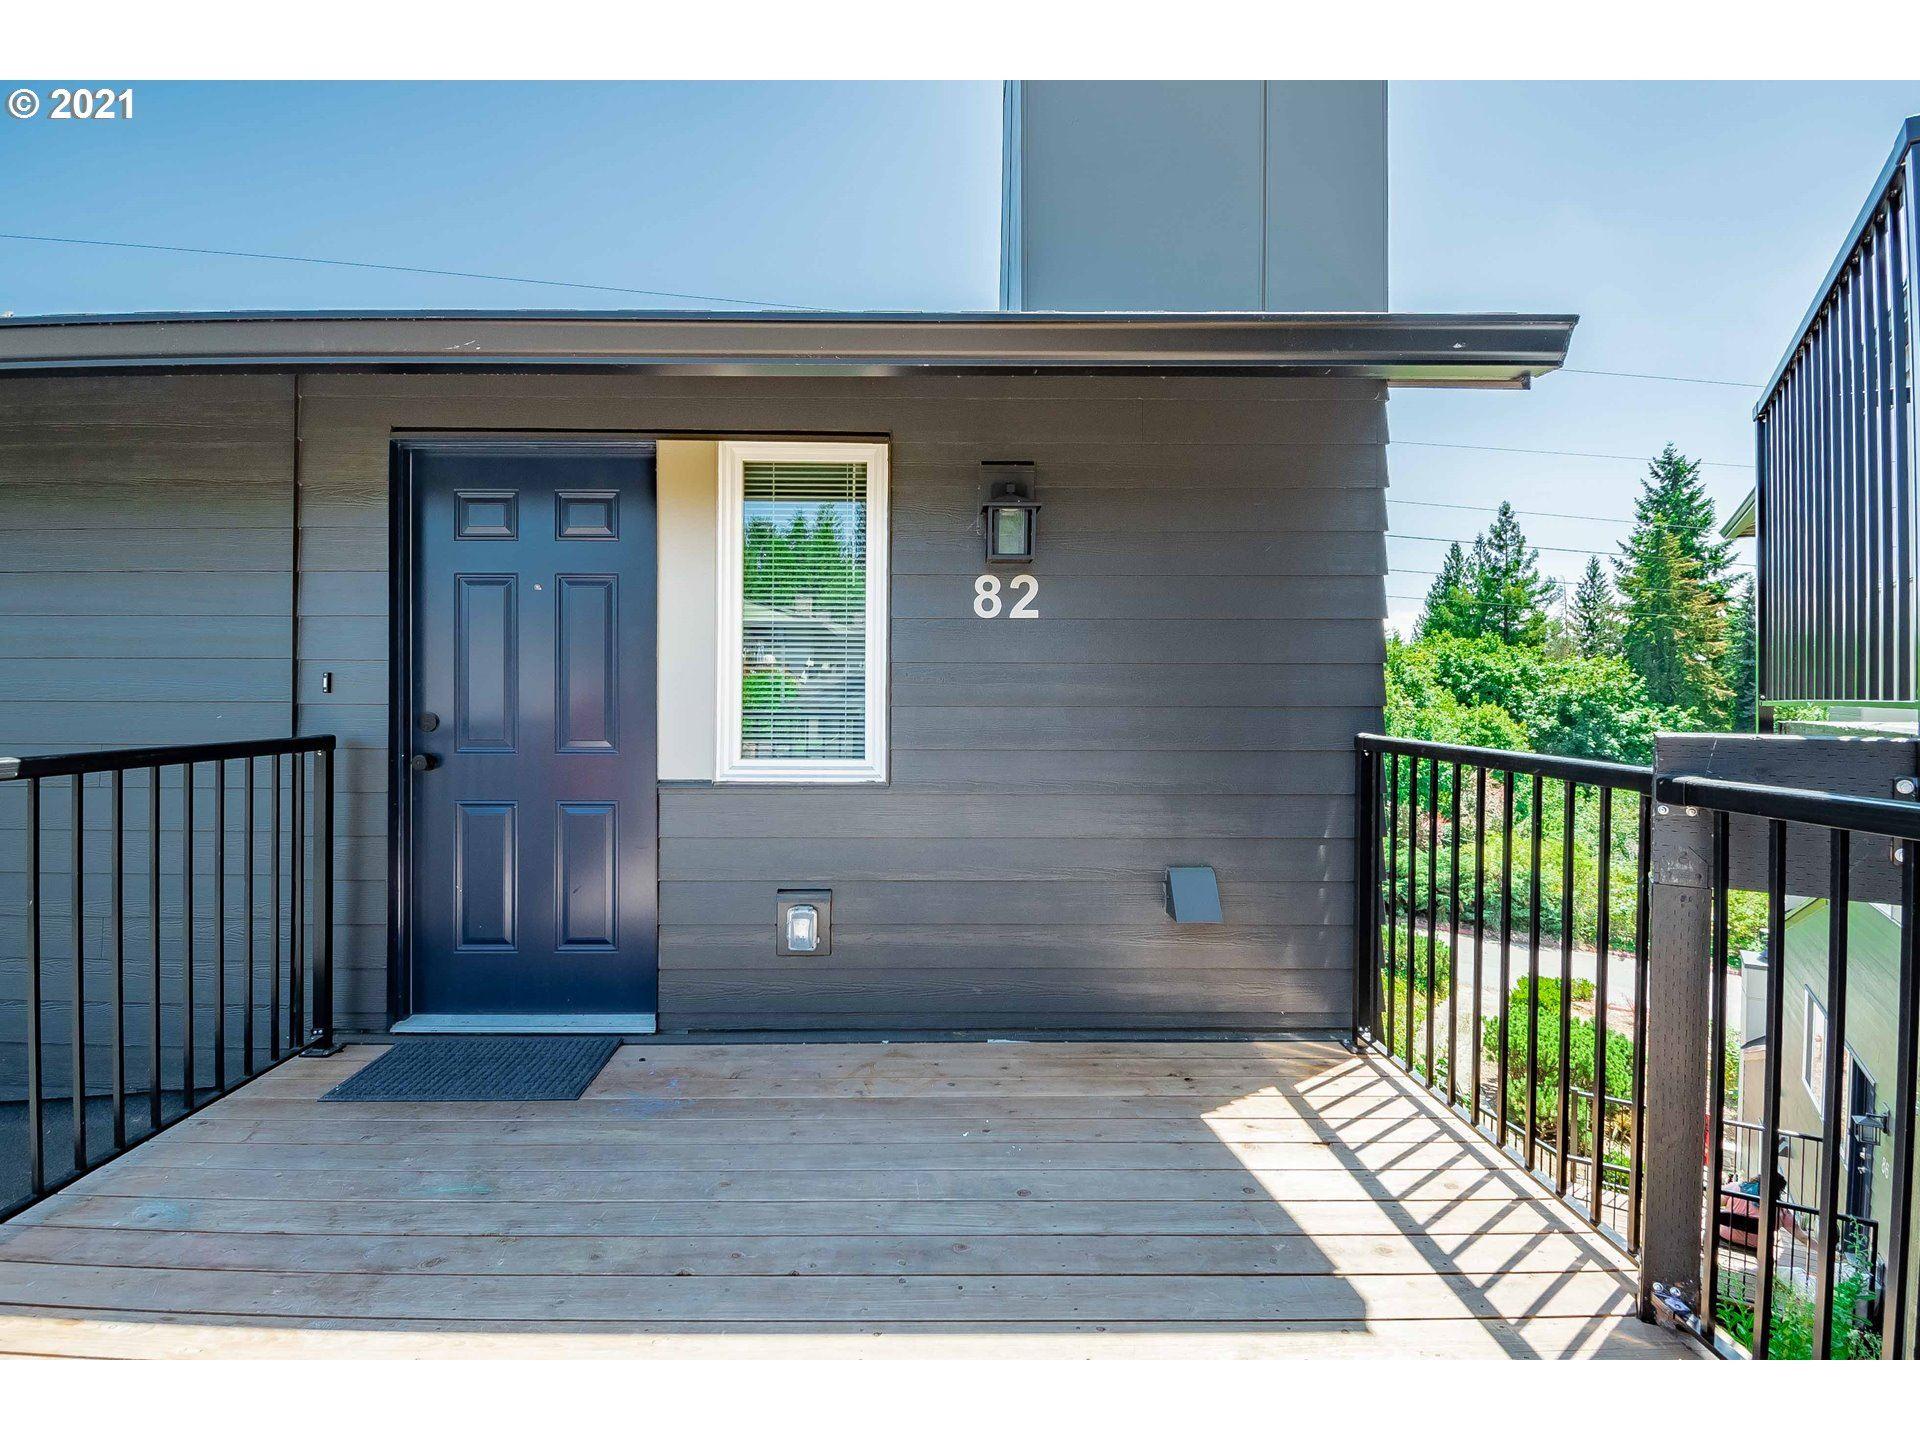 6208 NE 17TH AVE #J 82, Vancouver, WA 98665 - MLS#: 21597567